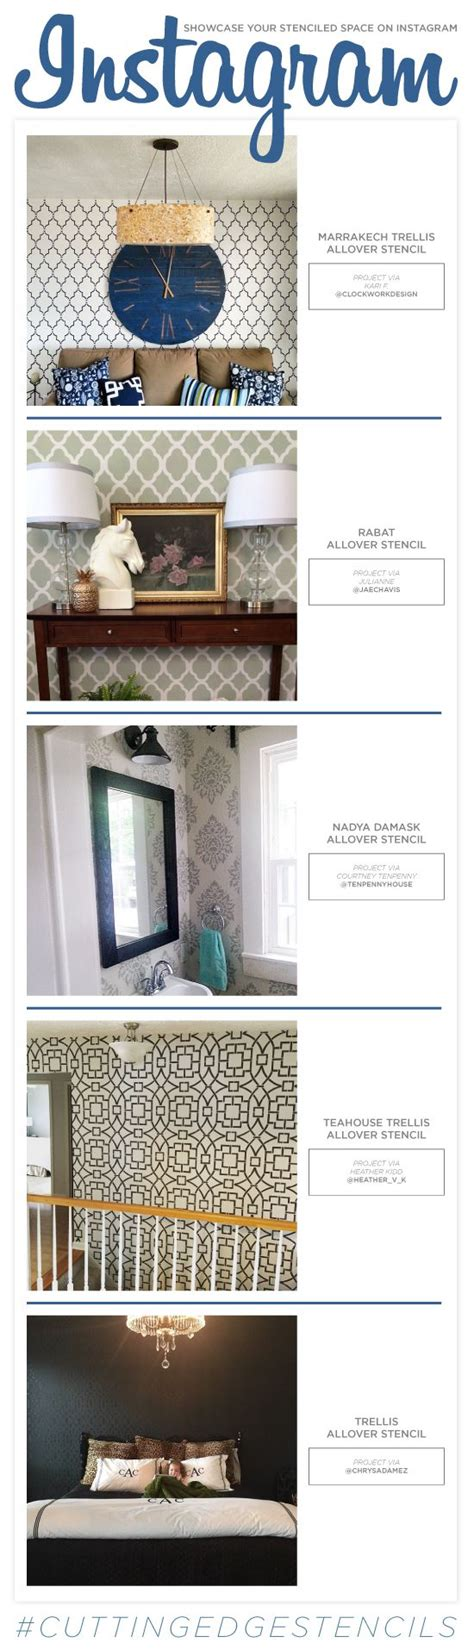 edge design instagram cutting edge stencils shares diy stenciled room ideas